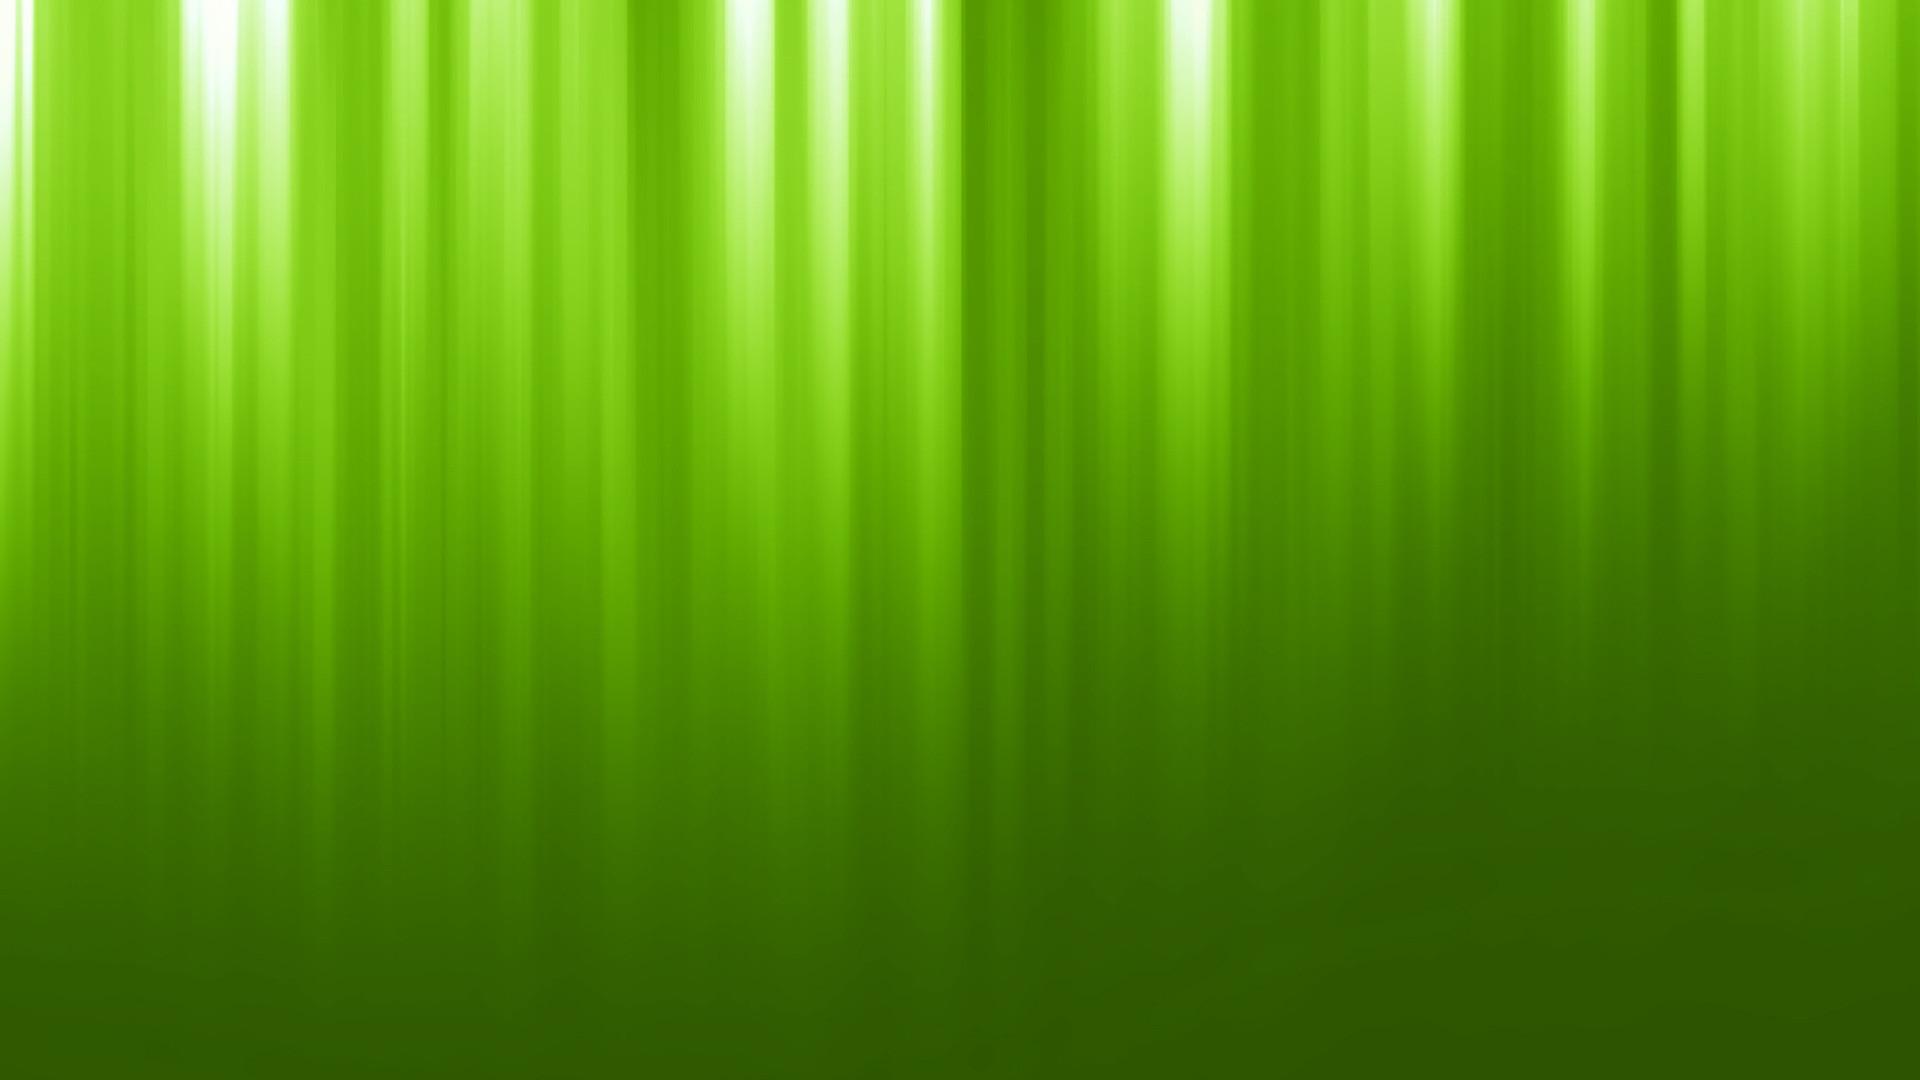 Green Wallpaper 1 Green Wallpaper 2 Green Wallpaper 2 …